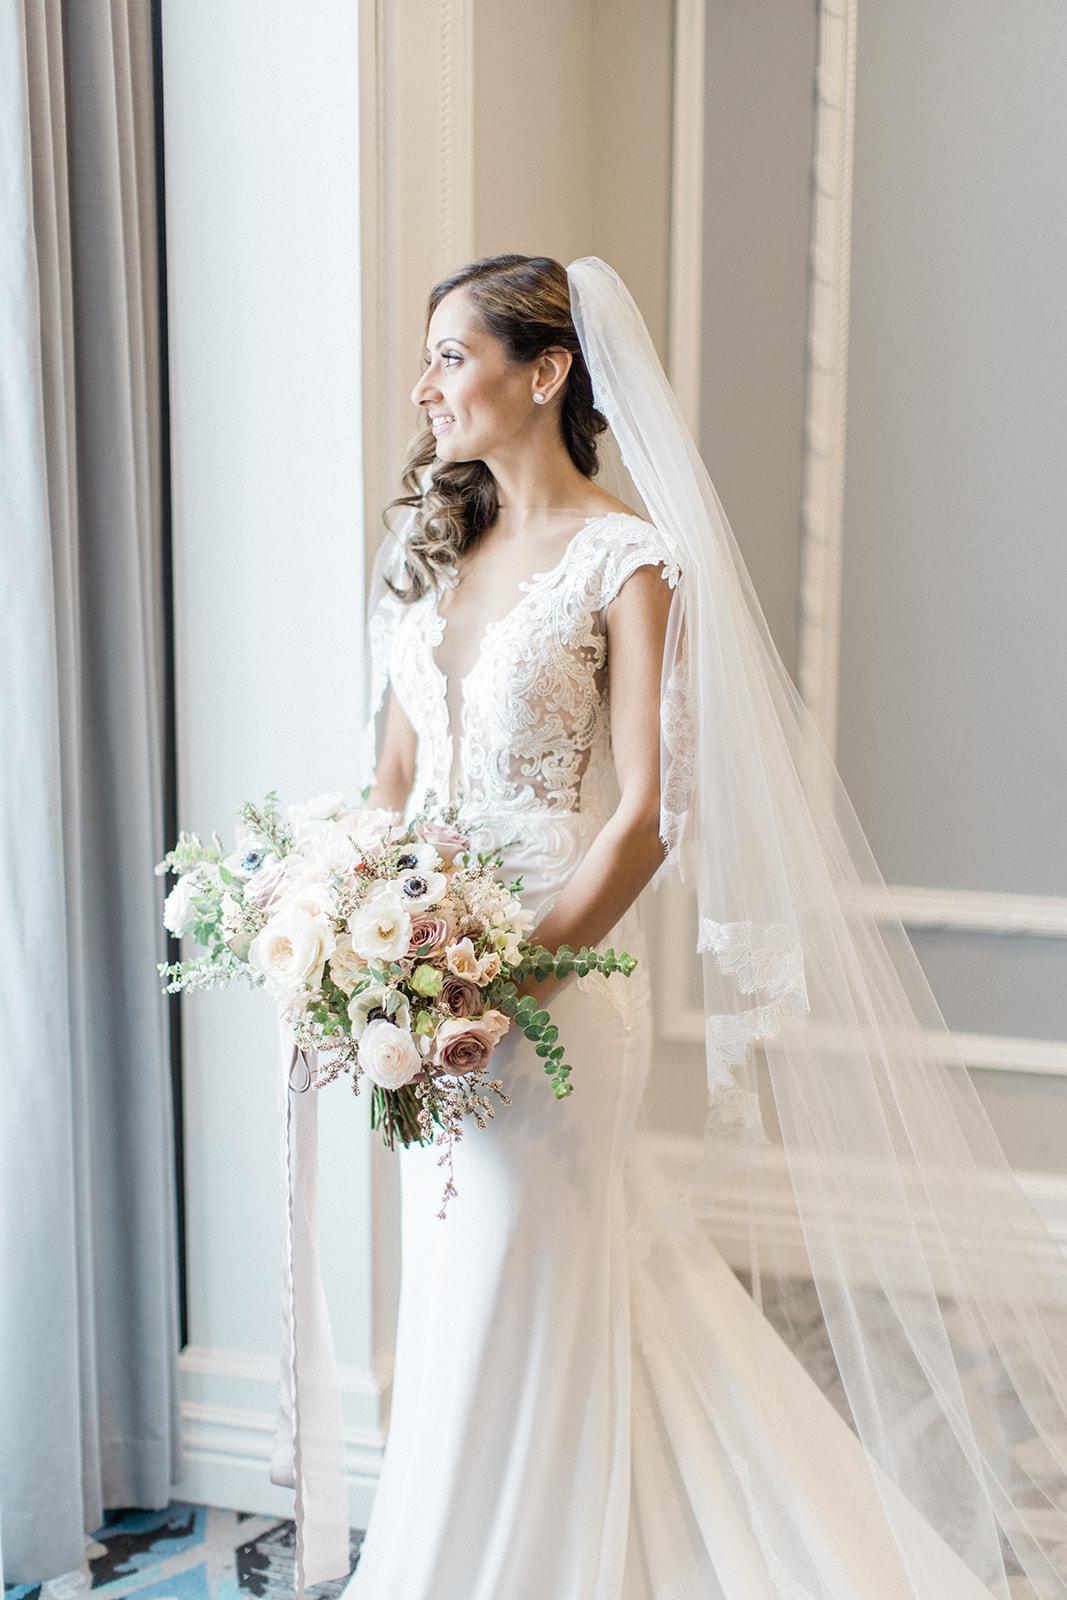 LisaCatherinePhotography_Jasmeen&Darren_Wedding-1056_websize.jpg